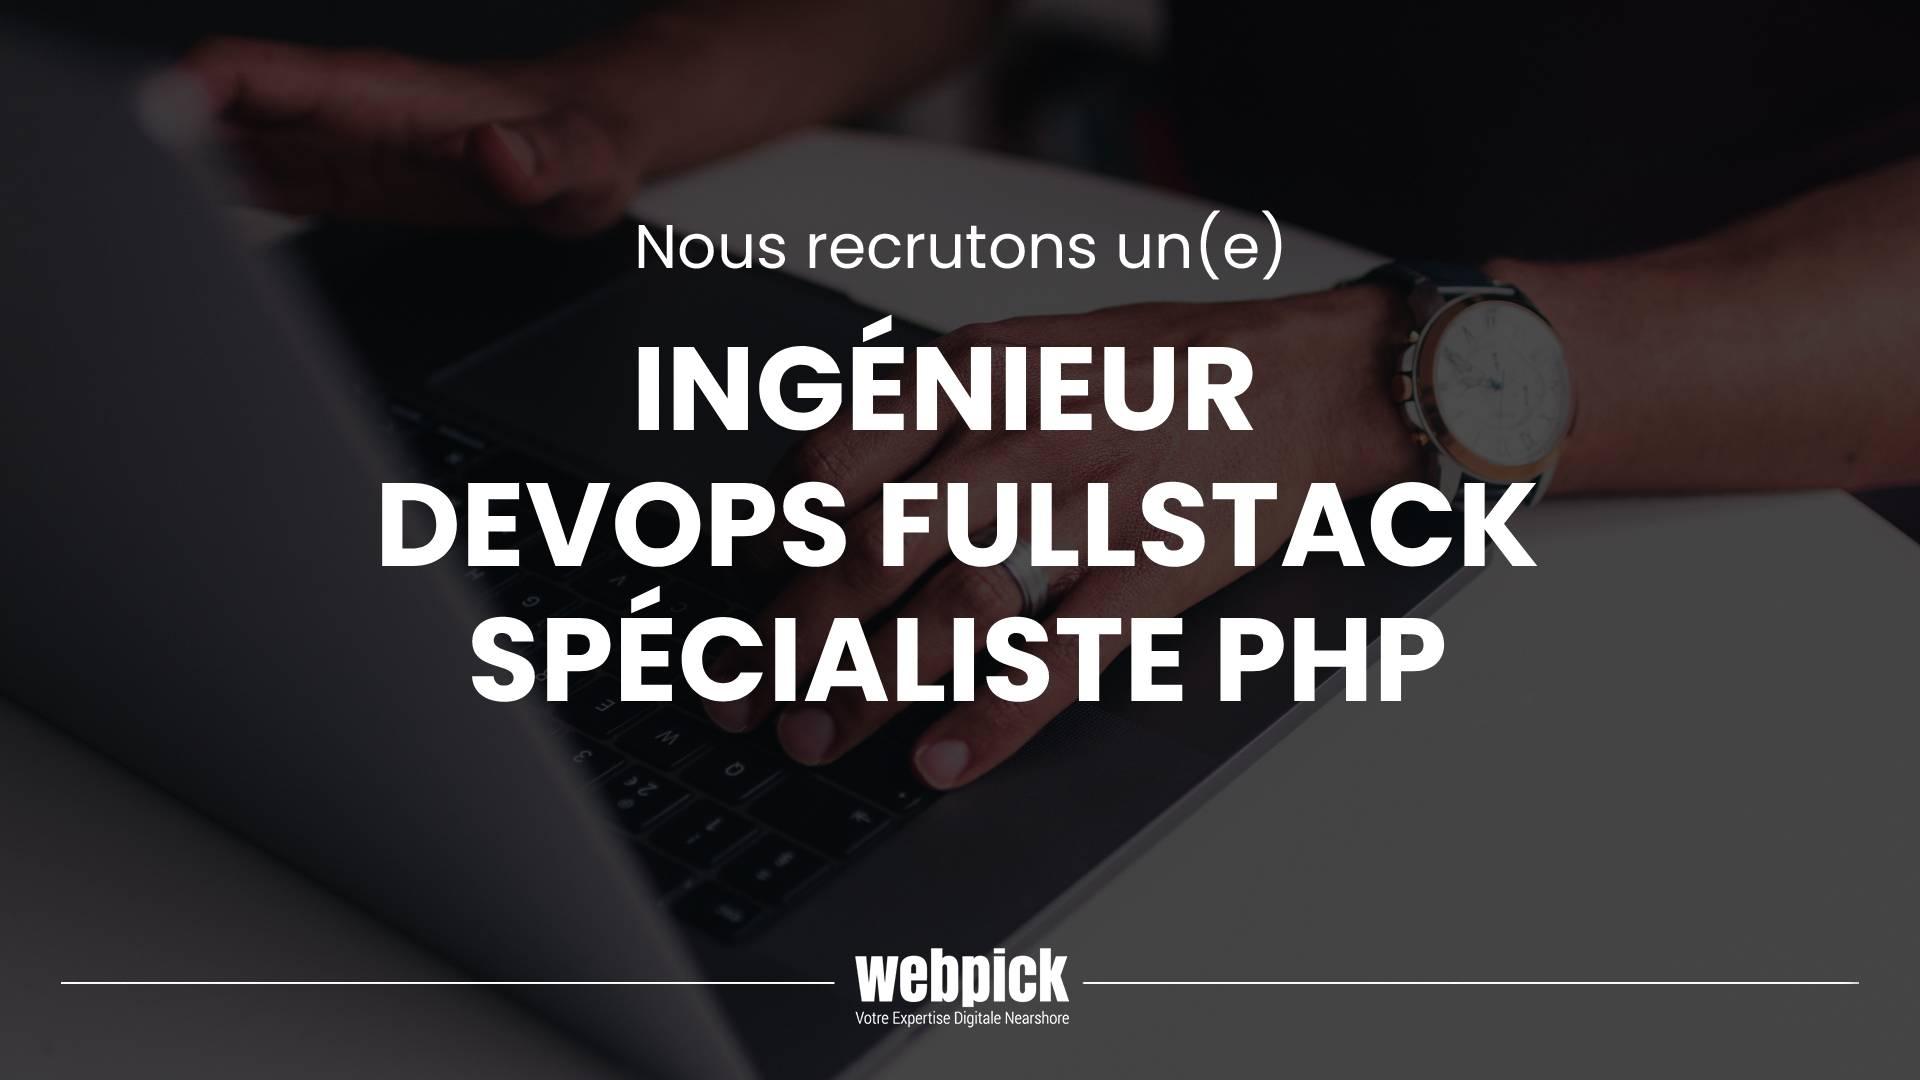 Ingénieur DevOps FullStack spécialiste PHP